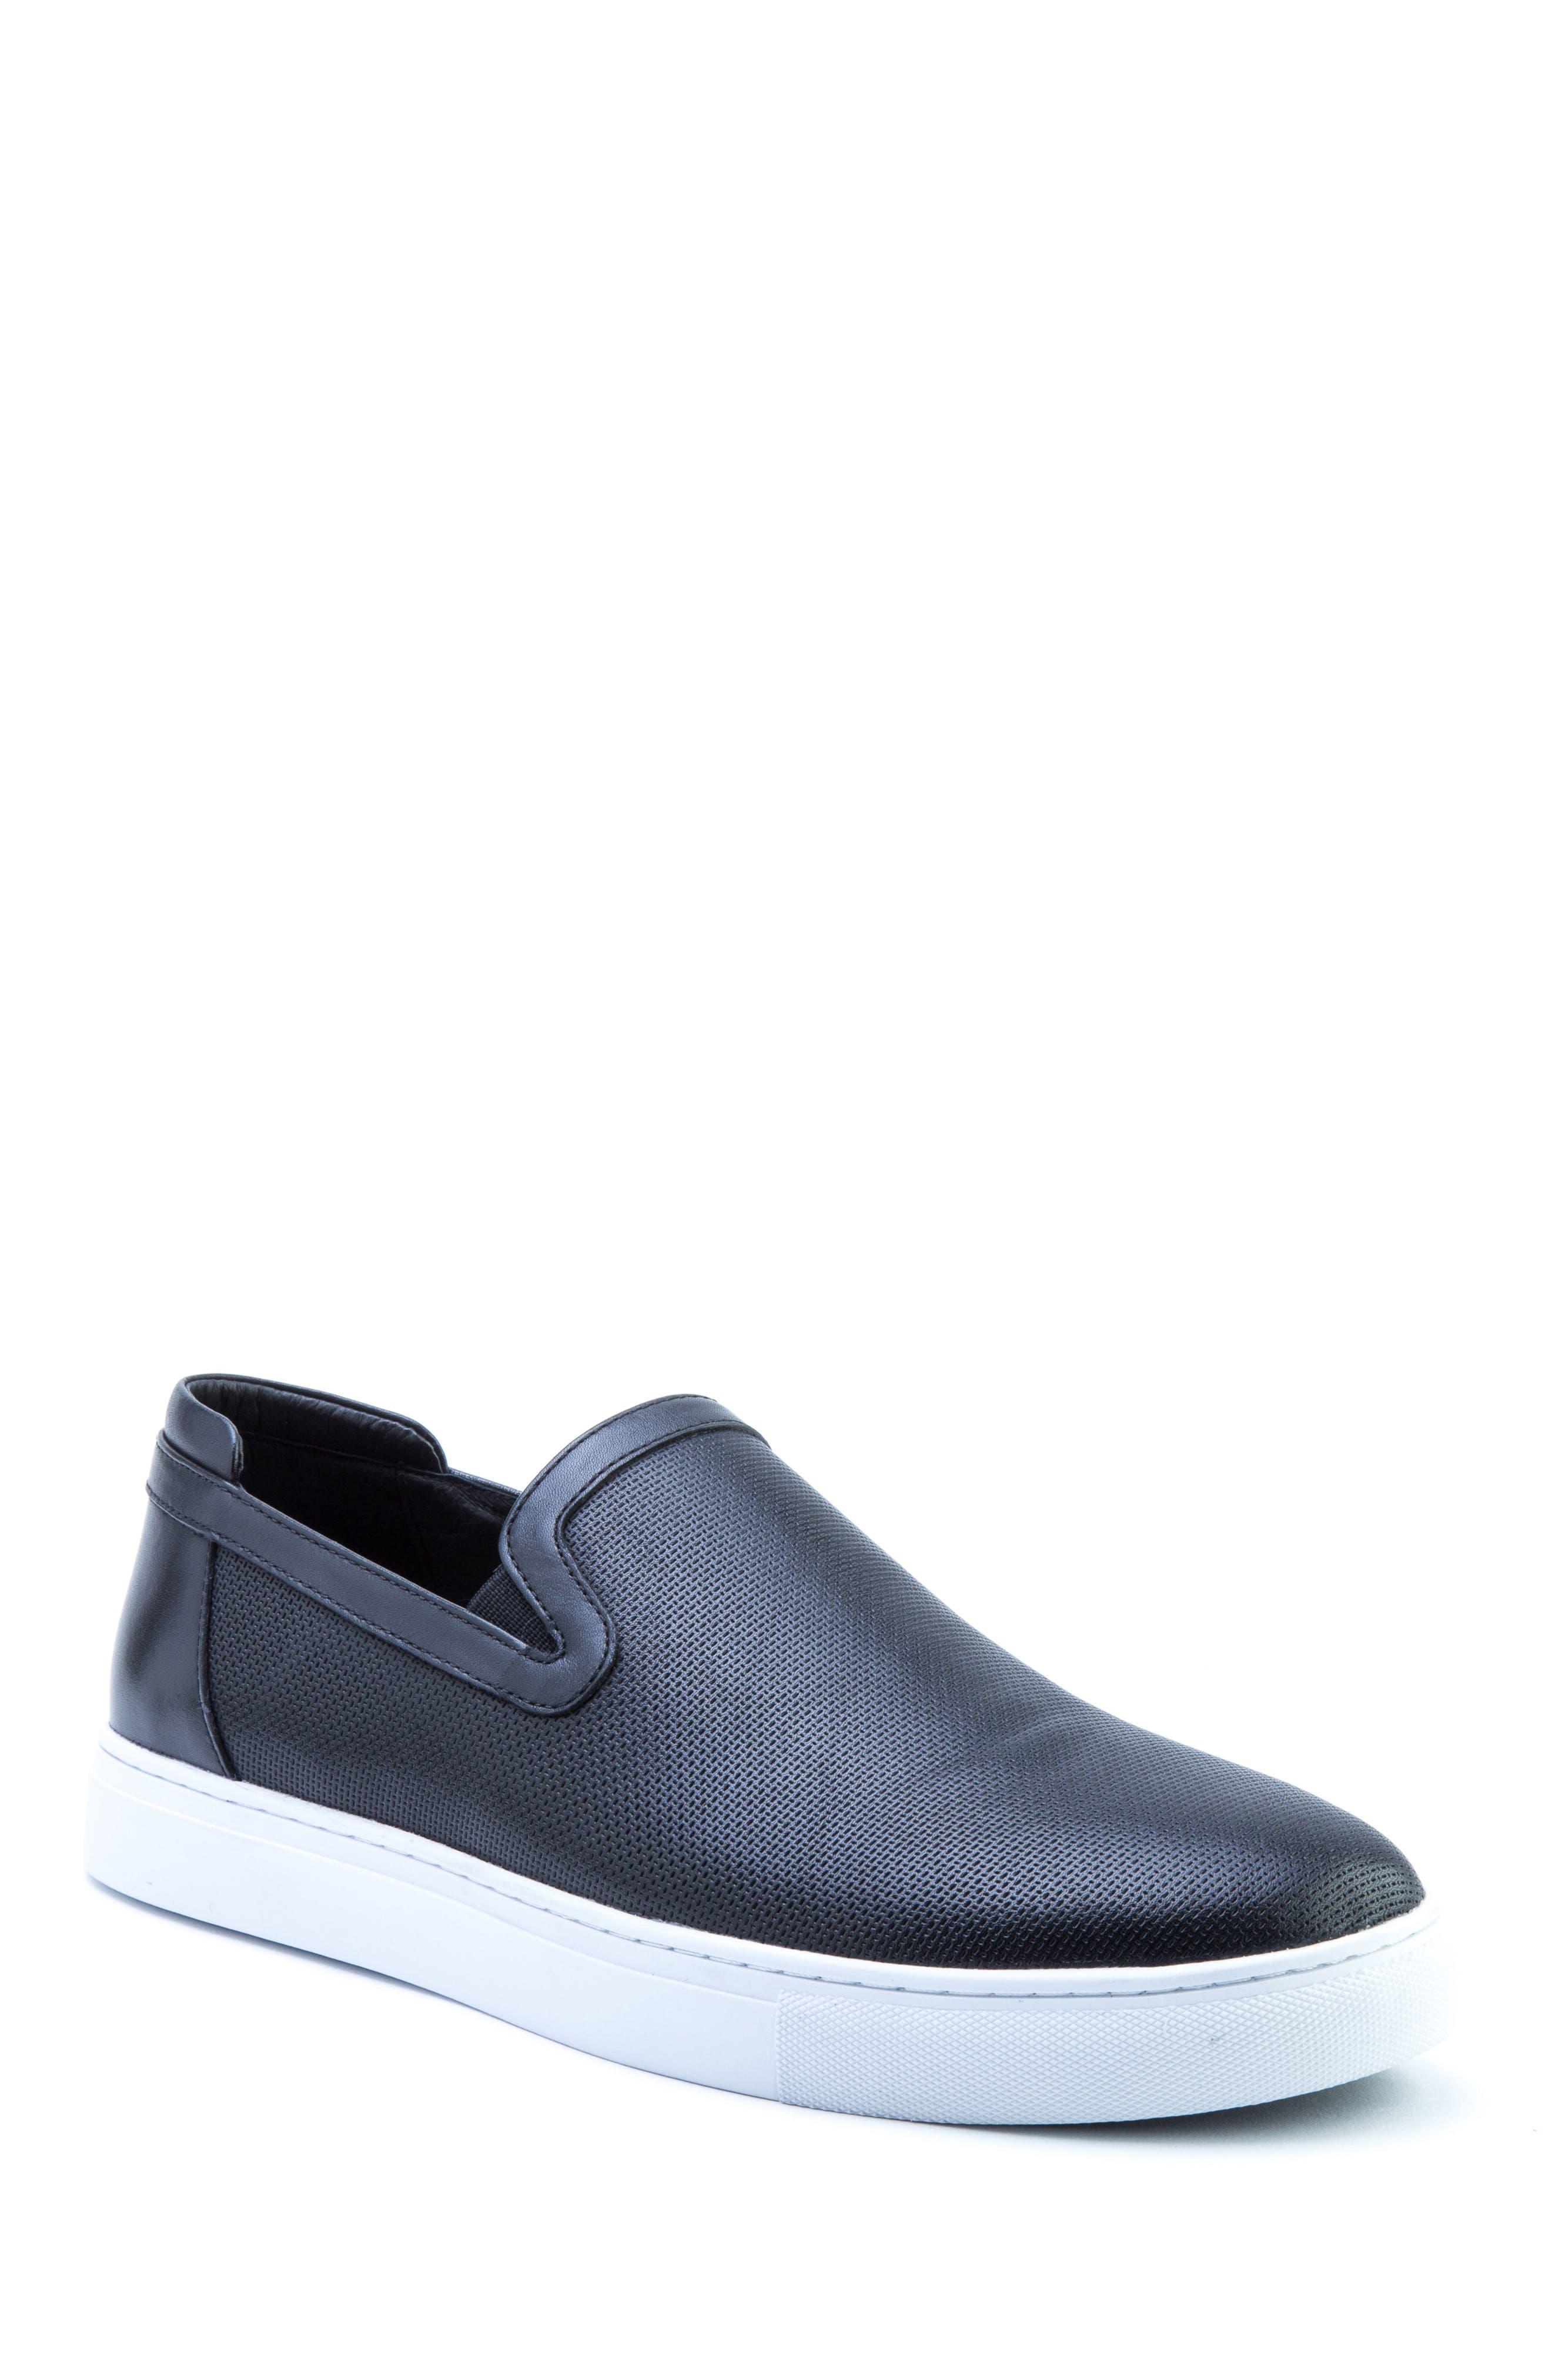 Grant Sneaker,                             Main thumbnail 1, color,                             BLACK LEATHER